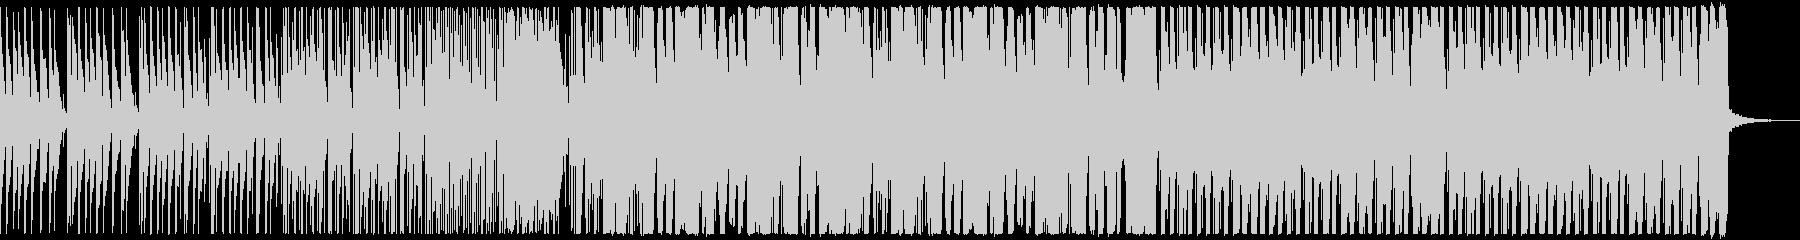 EDMの未再生の波形